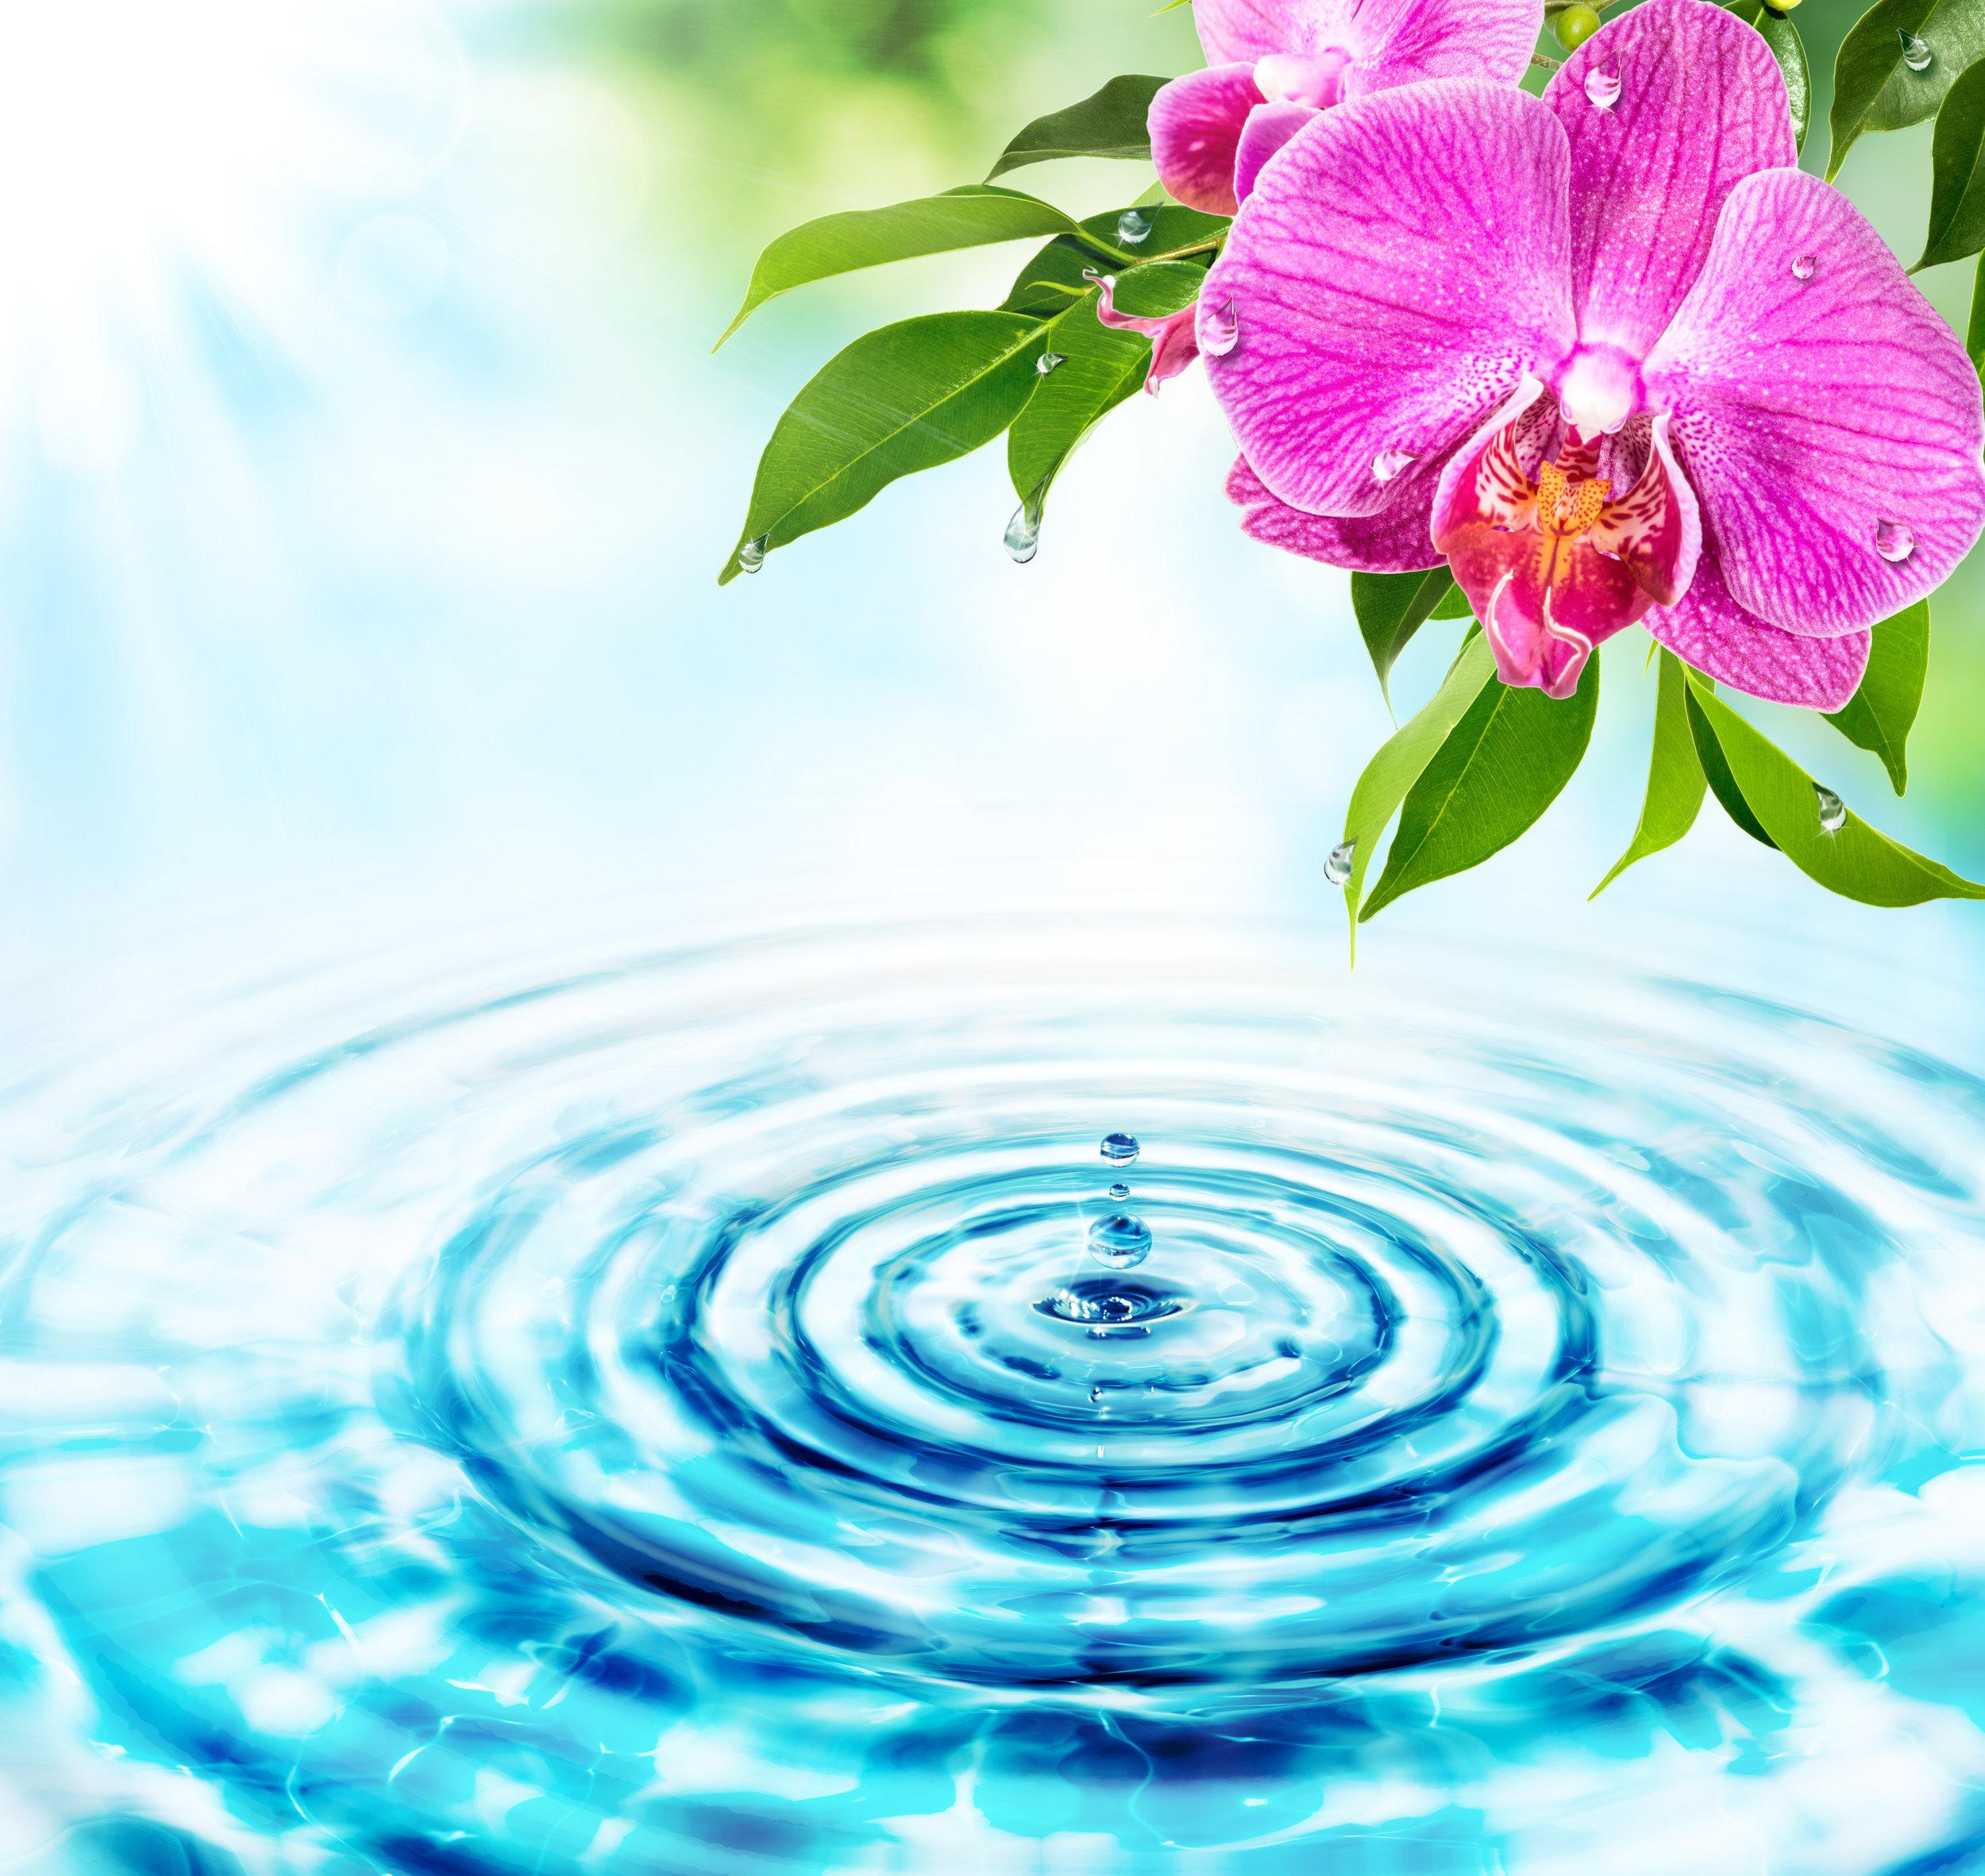 Lotus Blossom Leading ovarian regeneration using Platelet Rich Plasma and Enriched Platelet Factors